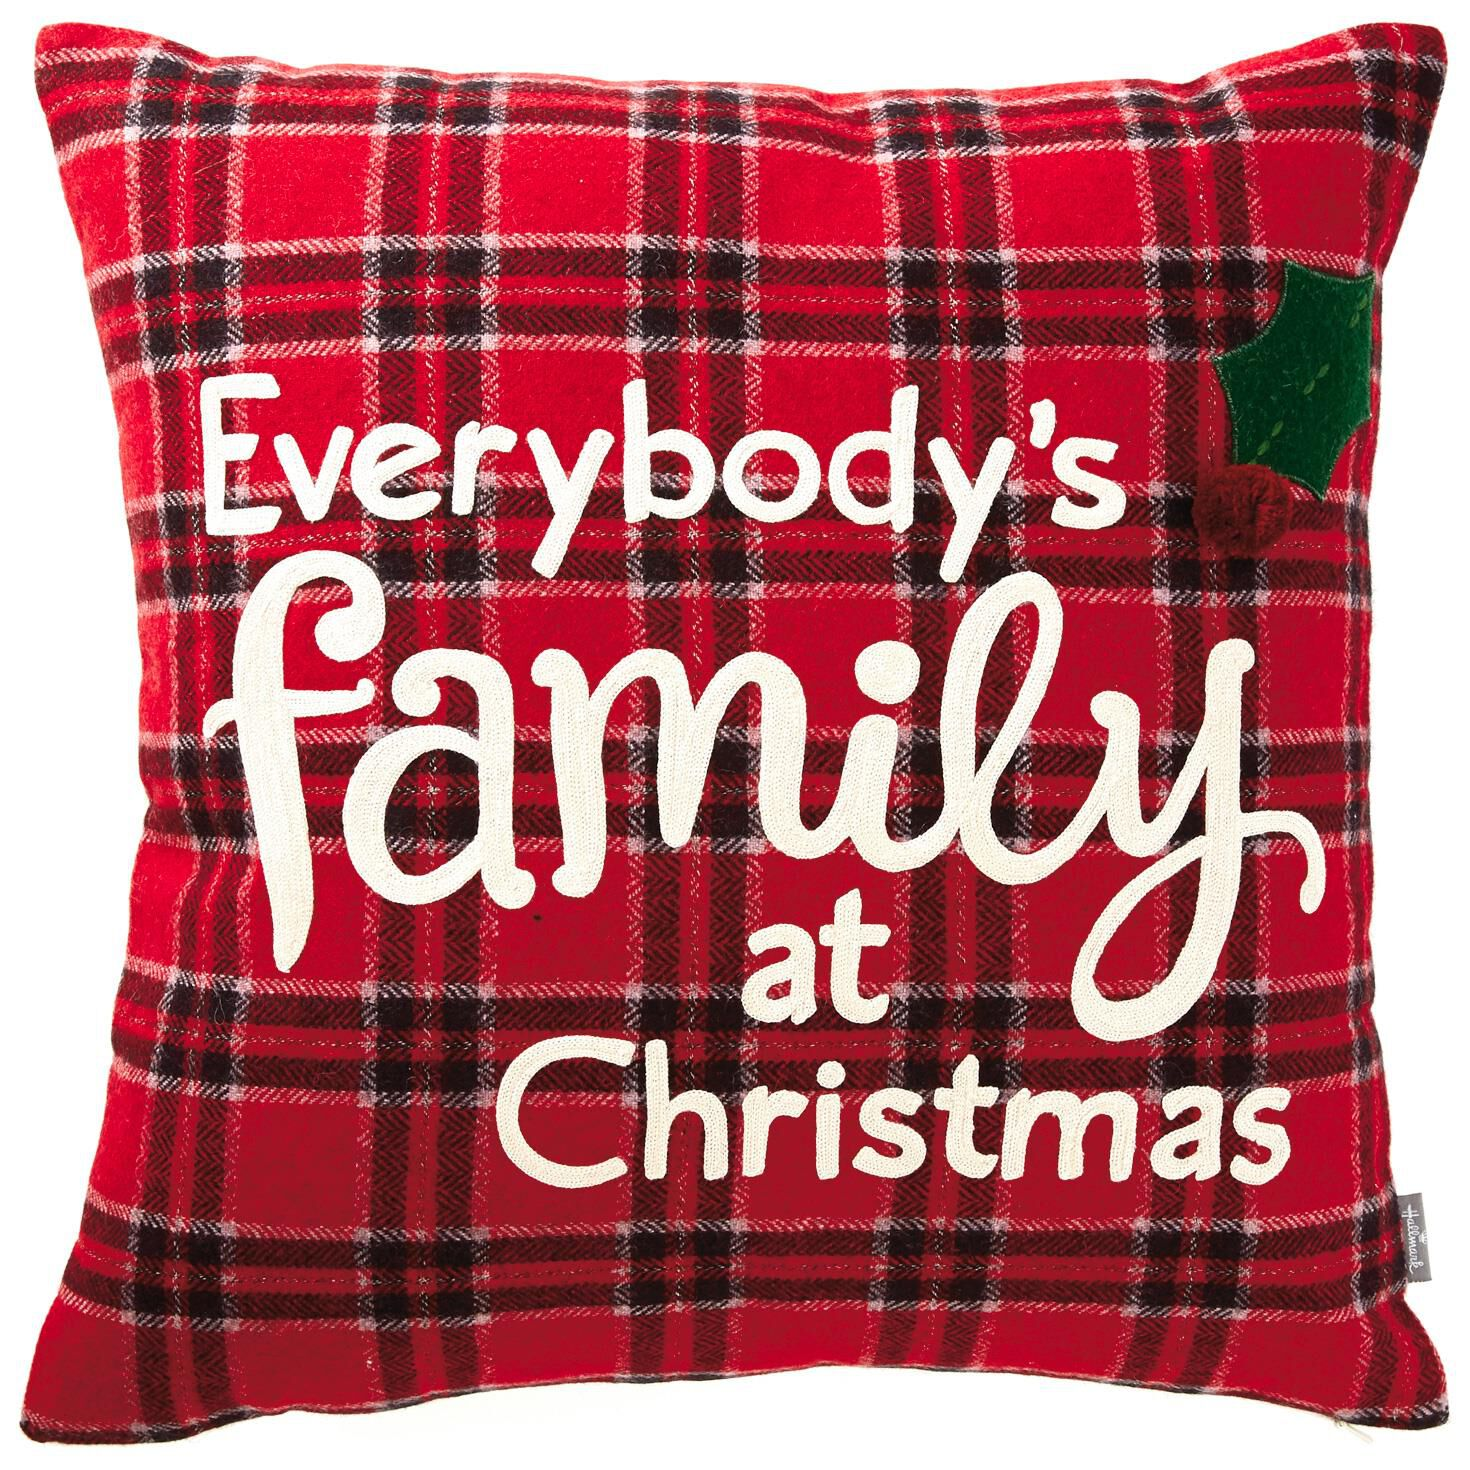 Family at Christmas Throw Pillow 18  Pillows  Blankets